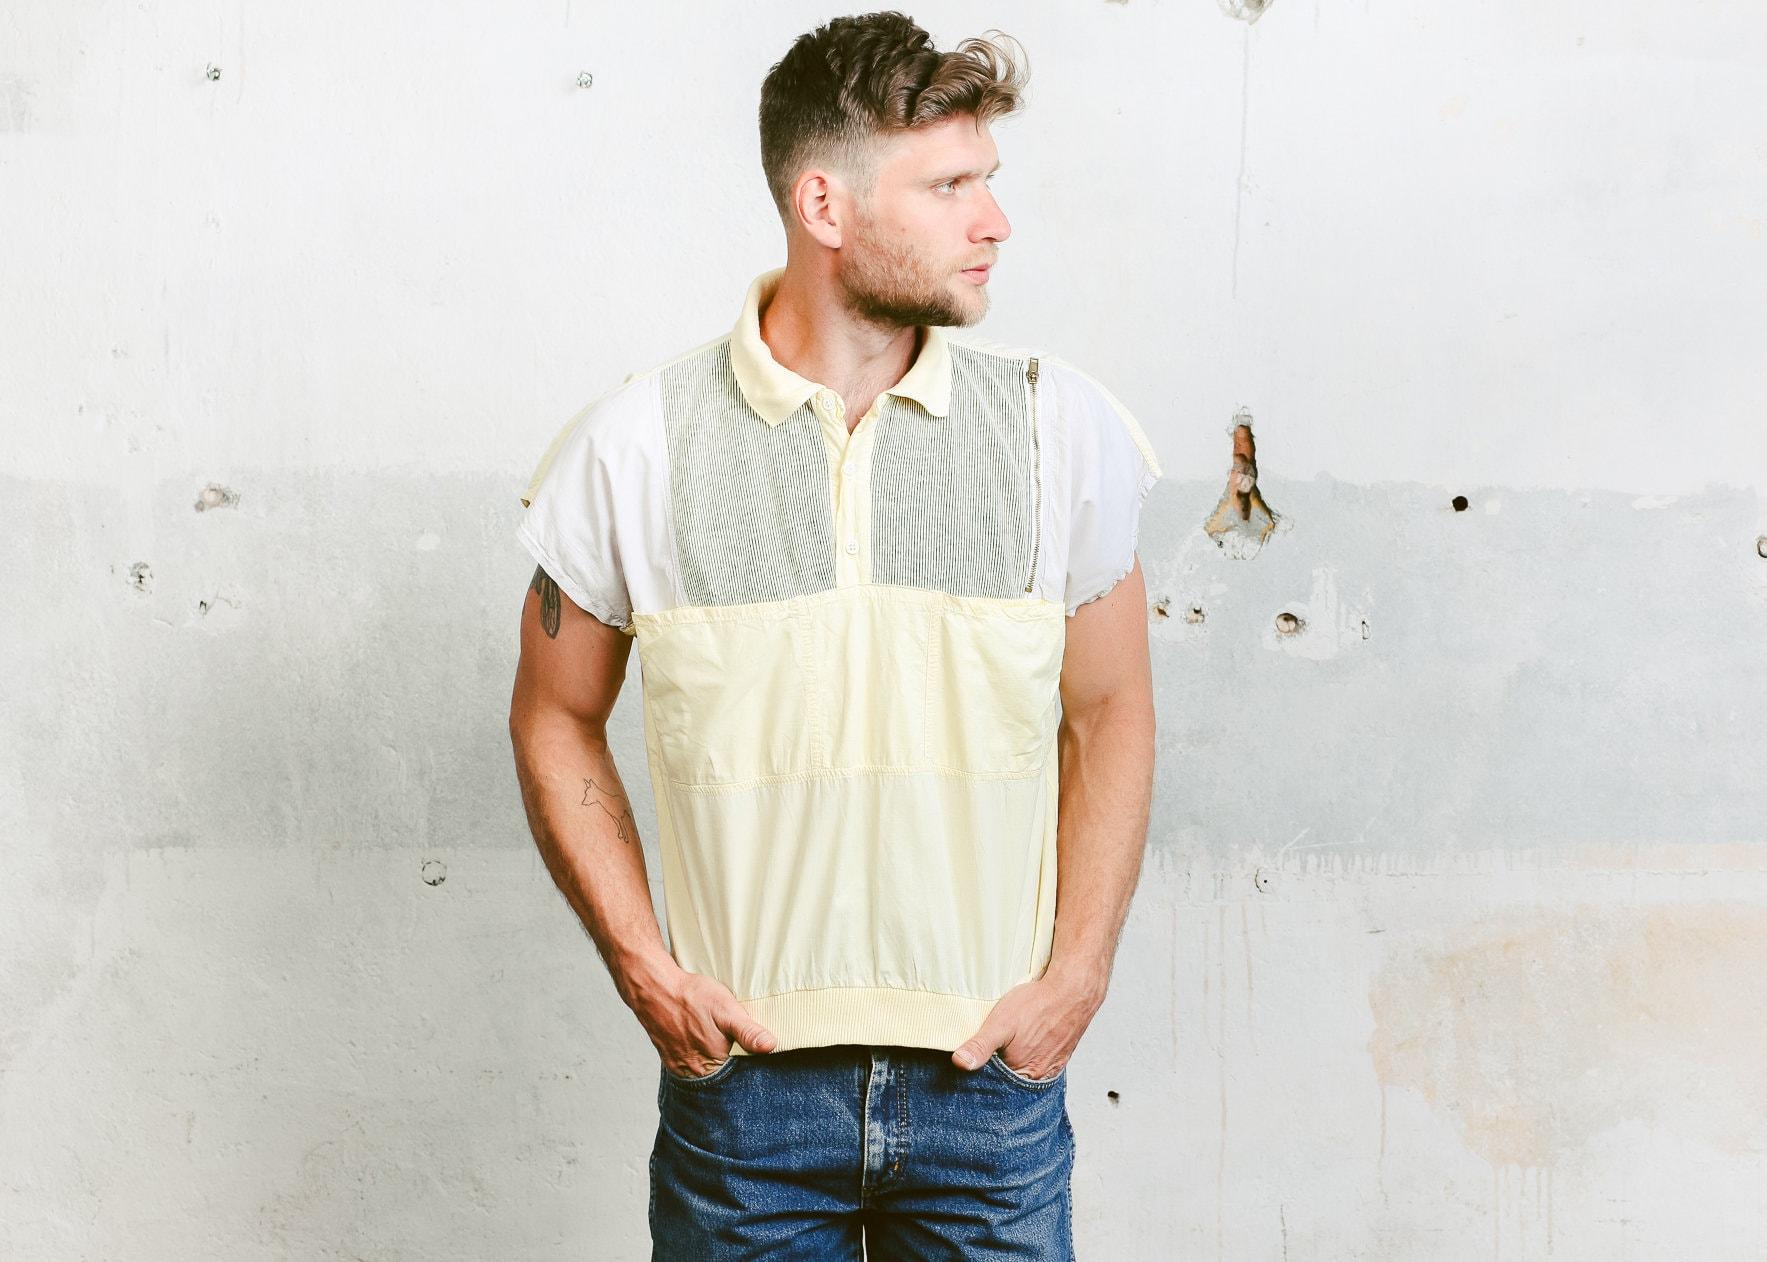 53ac0c998 90s Men Polo Shirt . Vintage Normcore Shirt Golf Tennis T-shirt Short  Sleeve Shirt Yellow Shirt Hipster Outfit . size Large